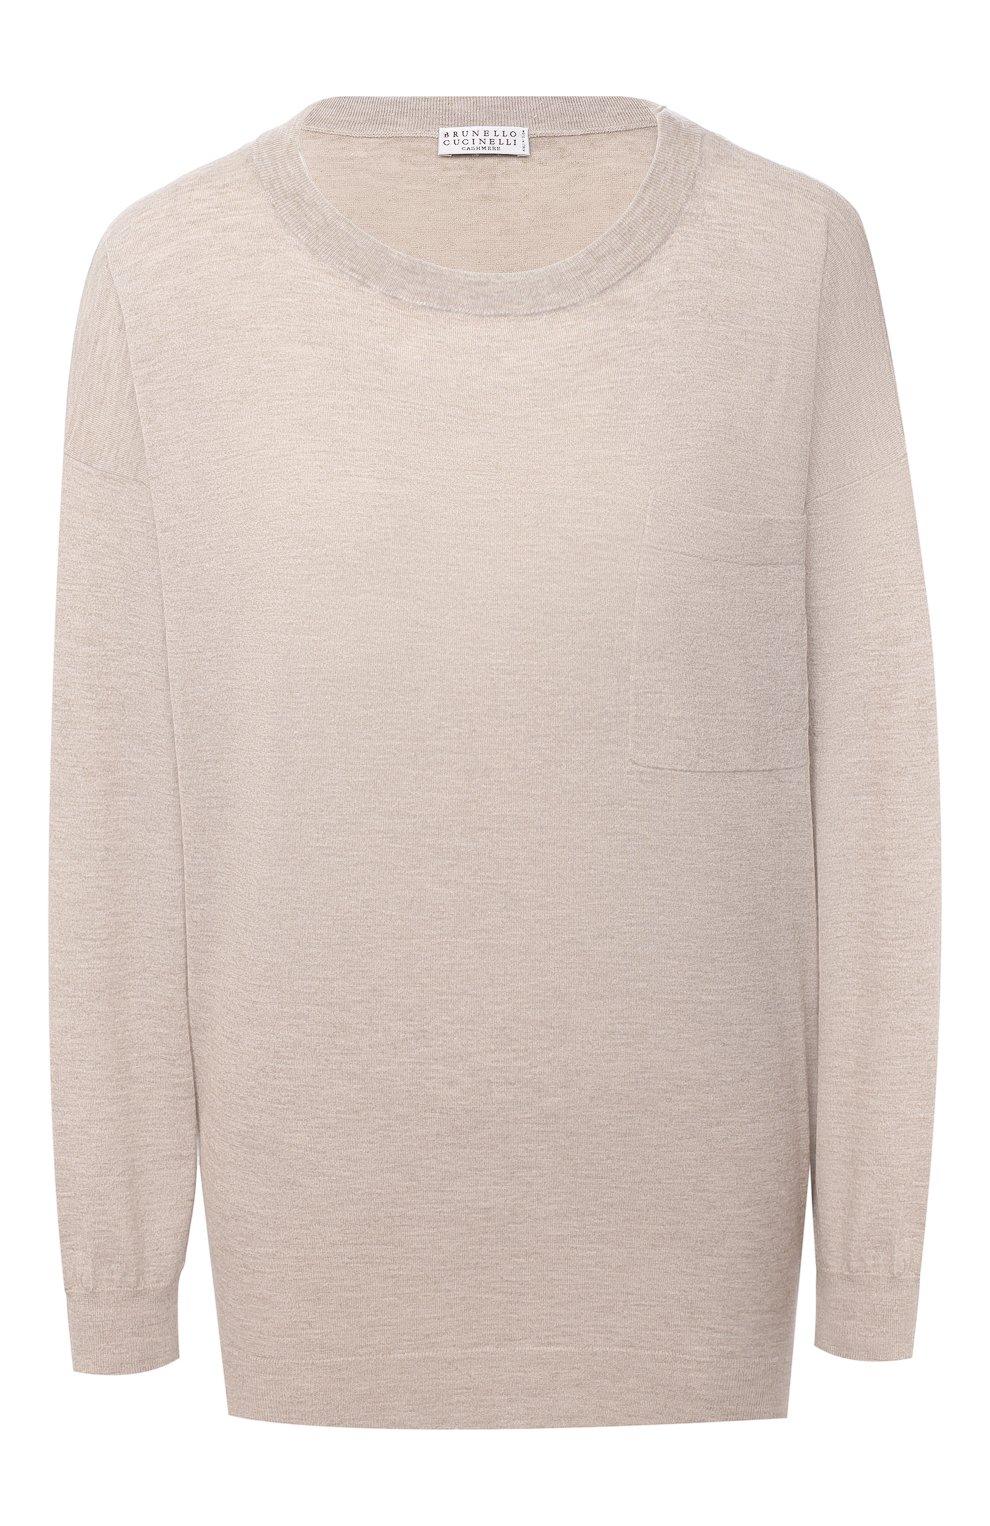 Женский пуловер BRUNELLO CUCINELLI бежевого цвета, арт. M9A820800 | Фото 1